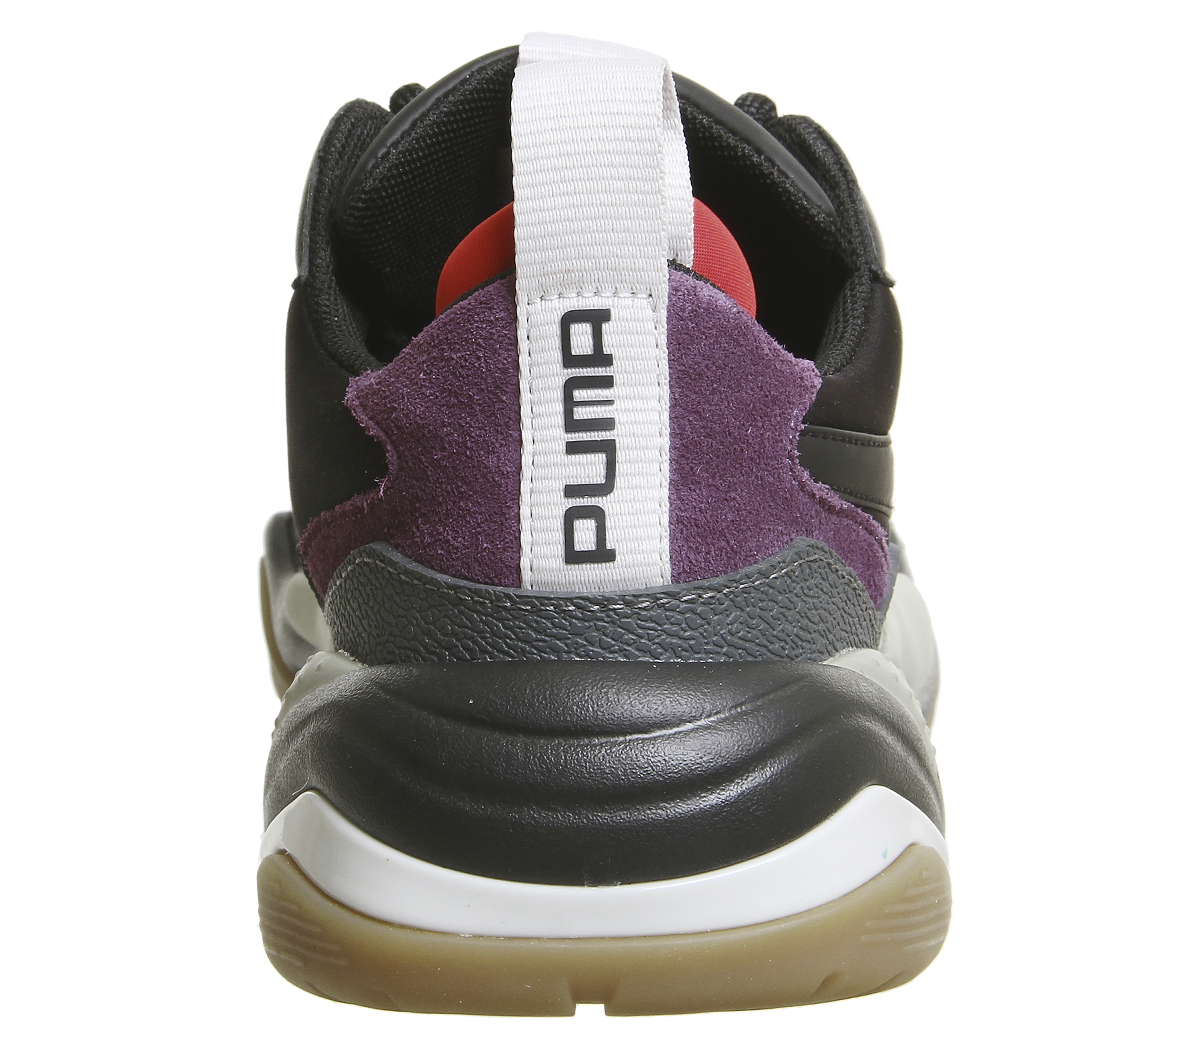 Details about Mens Puma Thunder Spectra Trainers Black Grey Purple Gum  Trainers Shoes